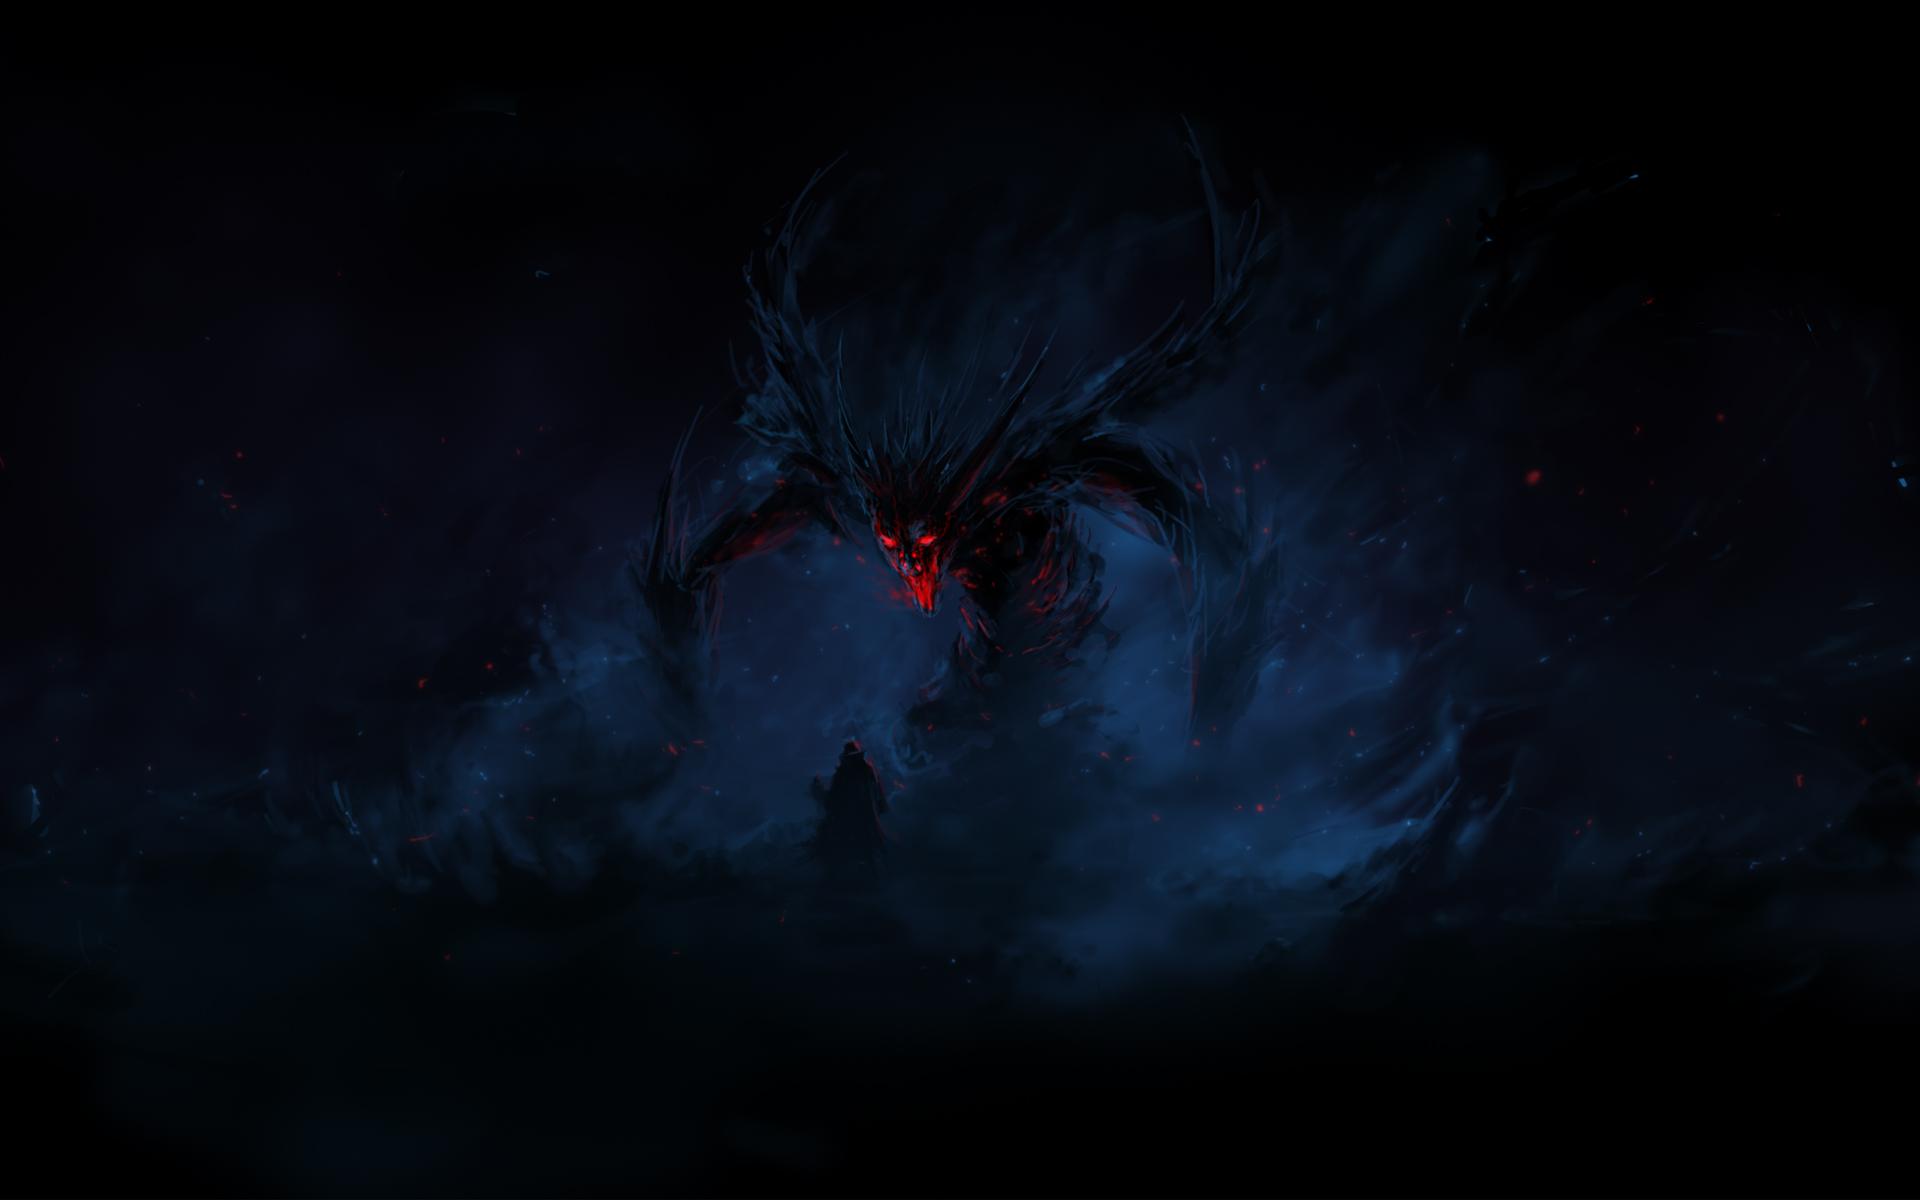 Demon hd wallpaper background image 1920x1200 id - Demon wallpaper 4k ...